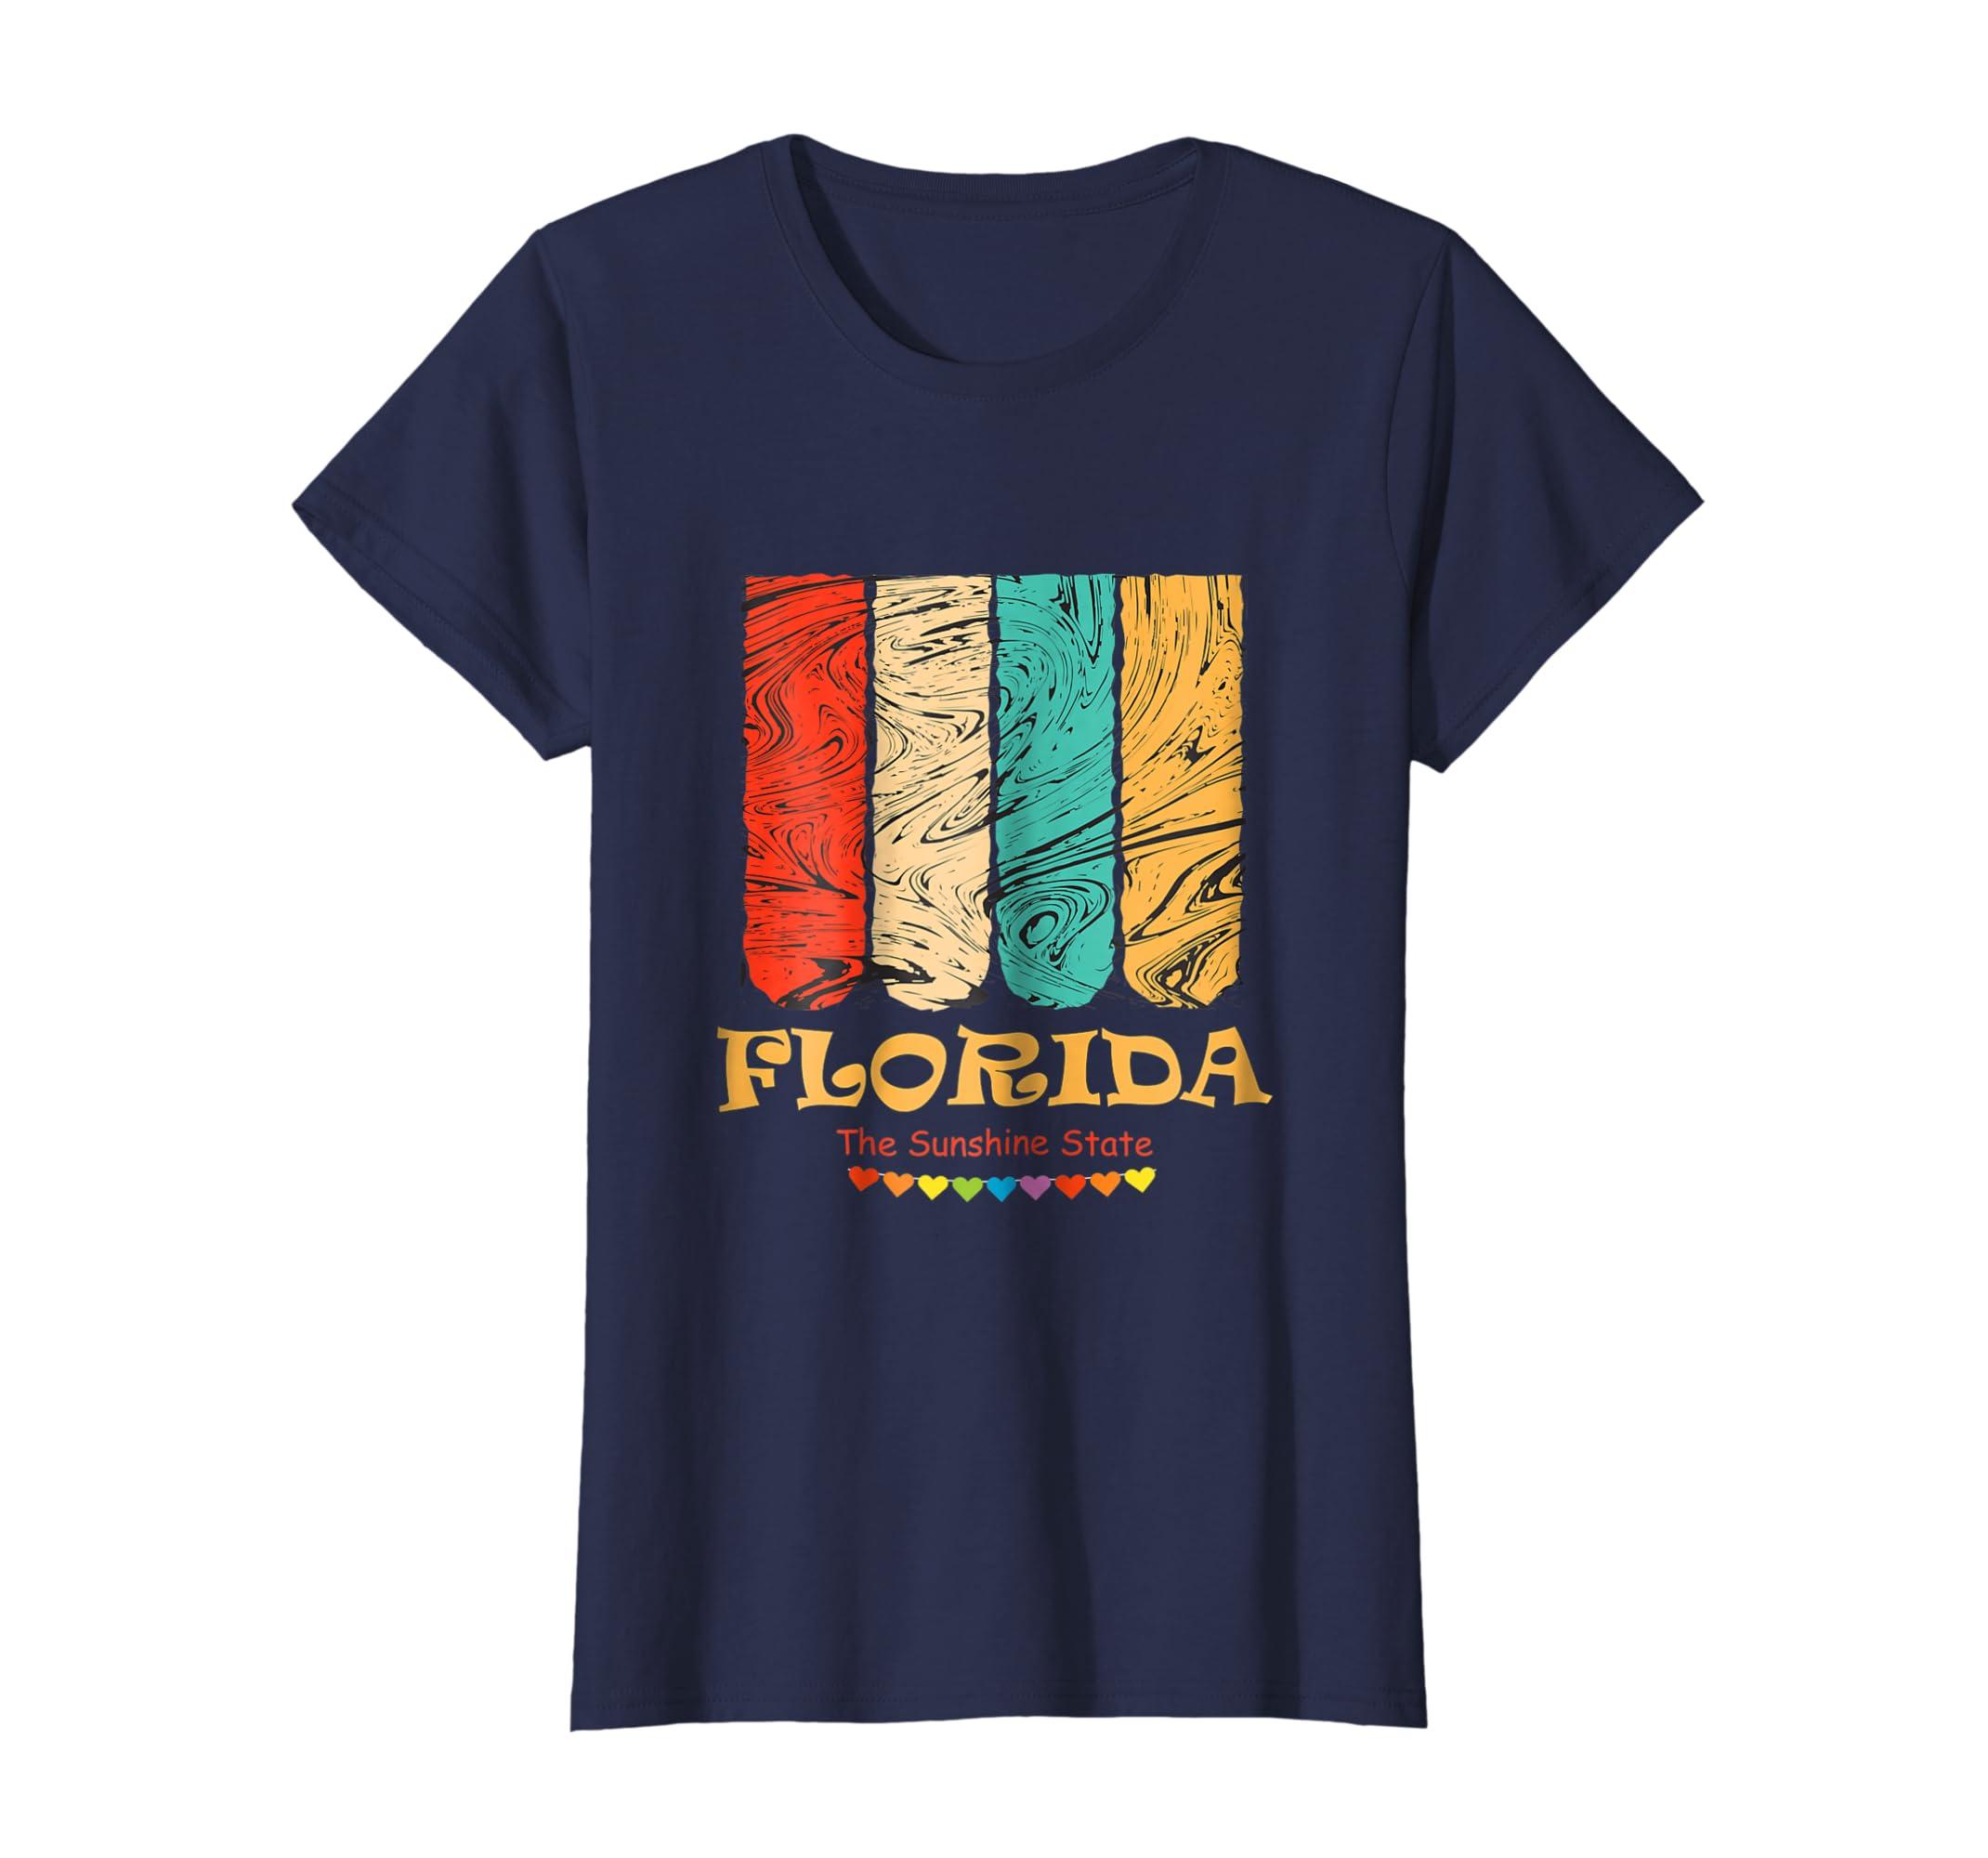 Amazon Retro Florida T Shirt Vintage 70s 80s Shirt Design Clothing